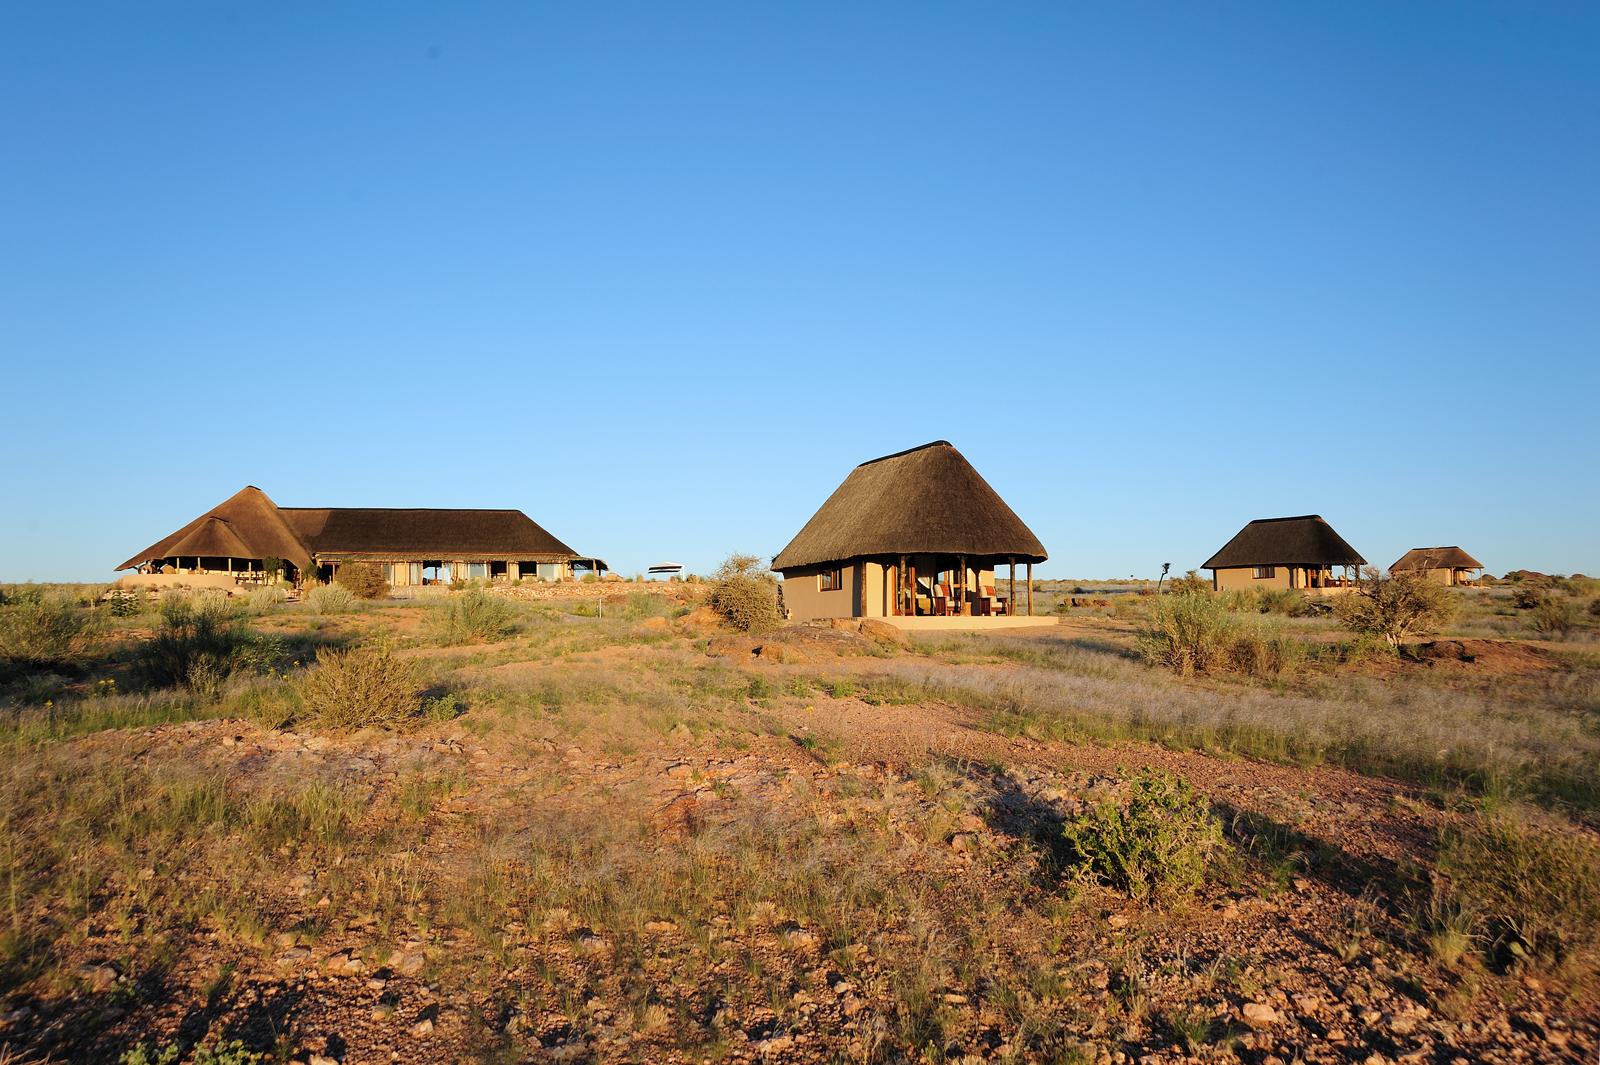 035 Sandfontein Lodge.tif